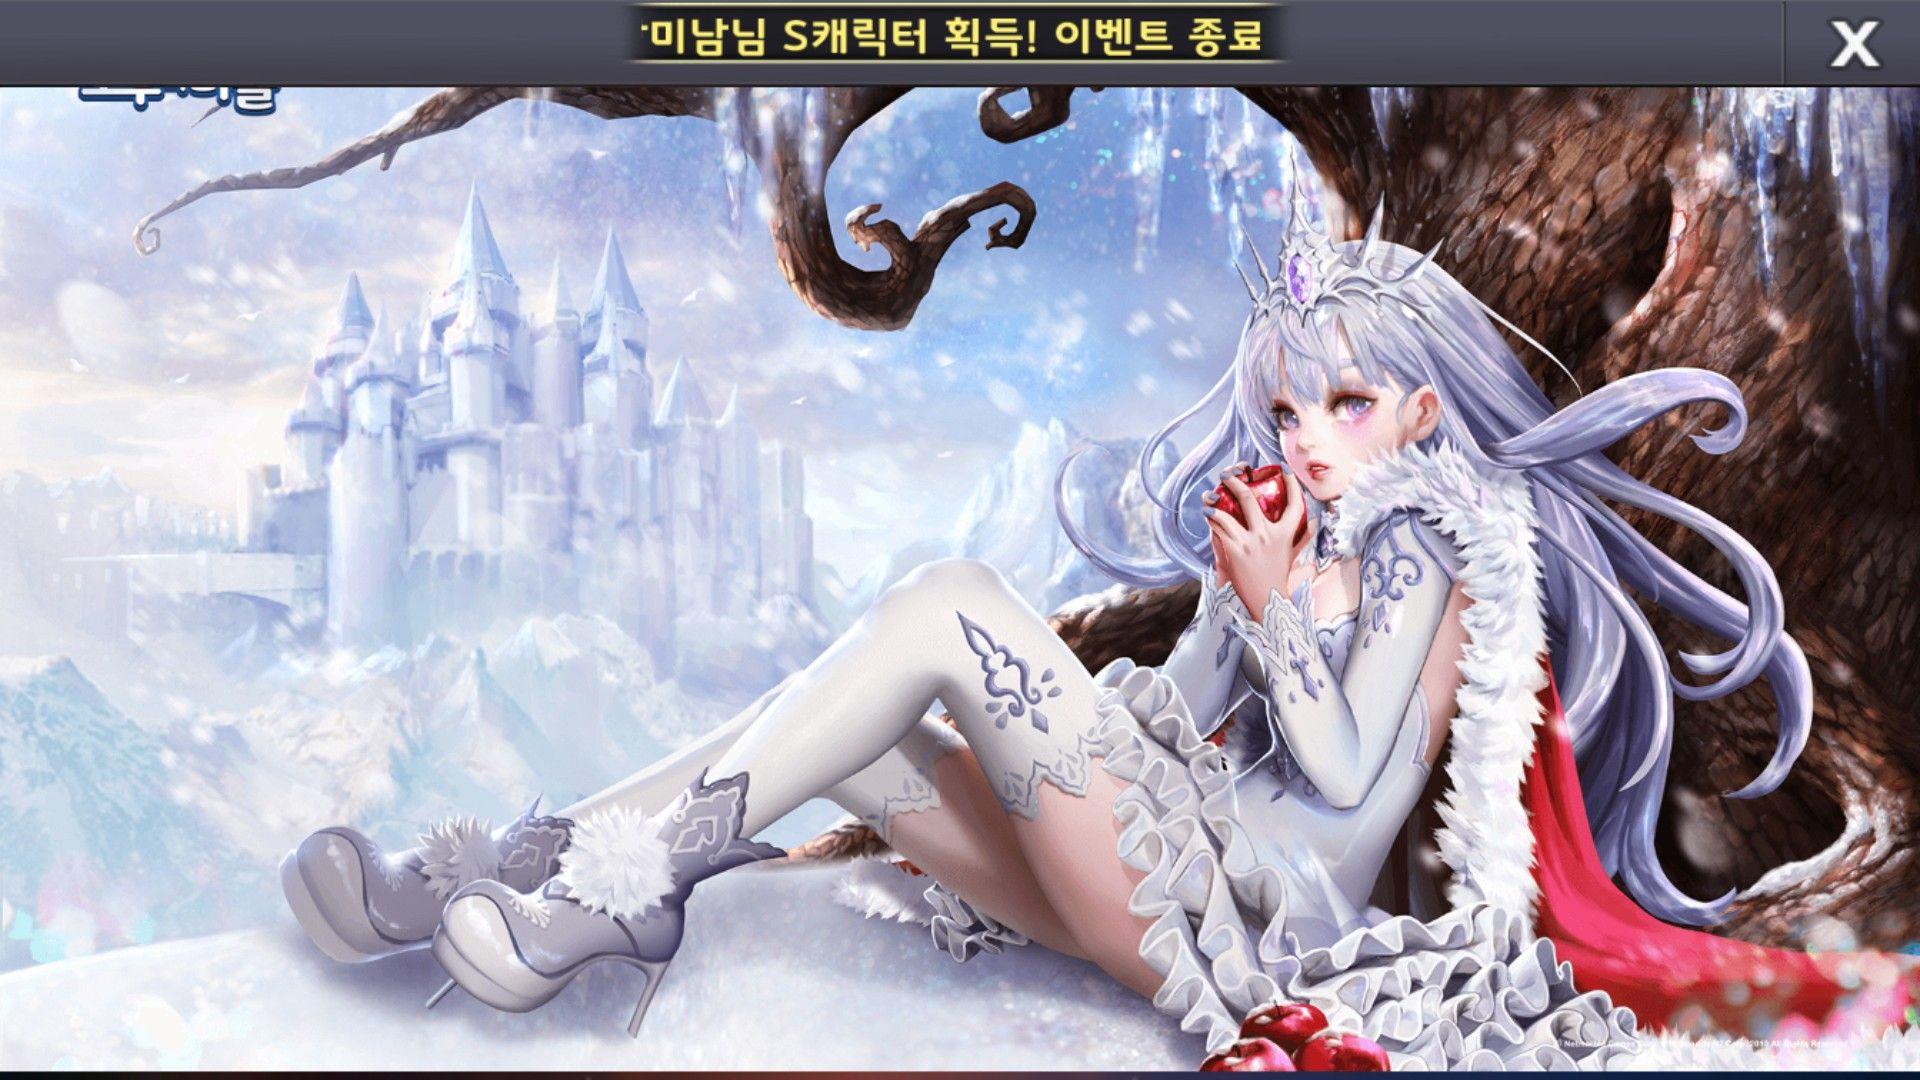 S.korea games mobile 모두의마블 캐릭터 일러스트, 마블